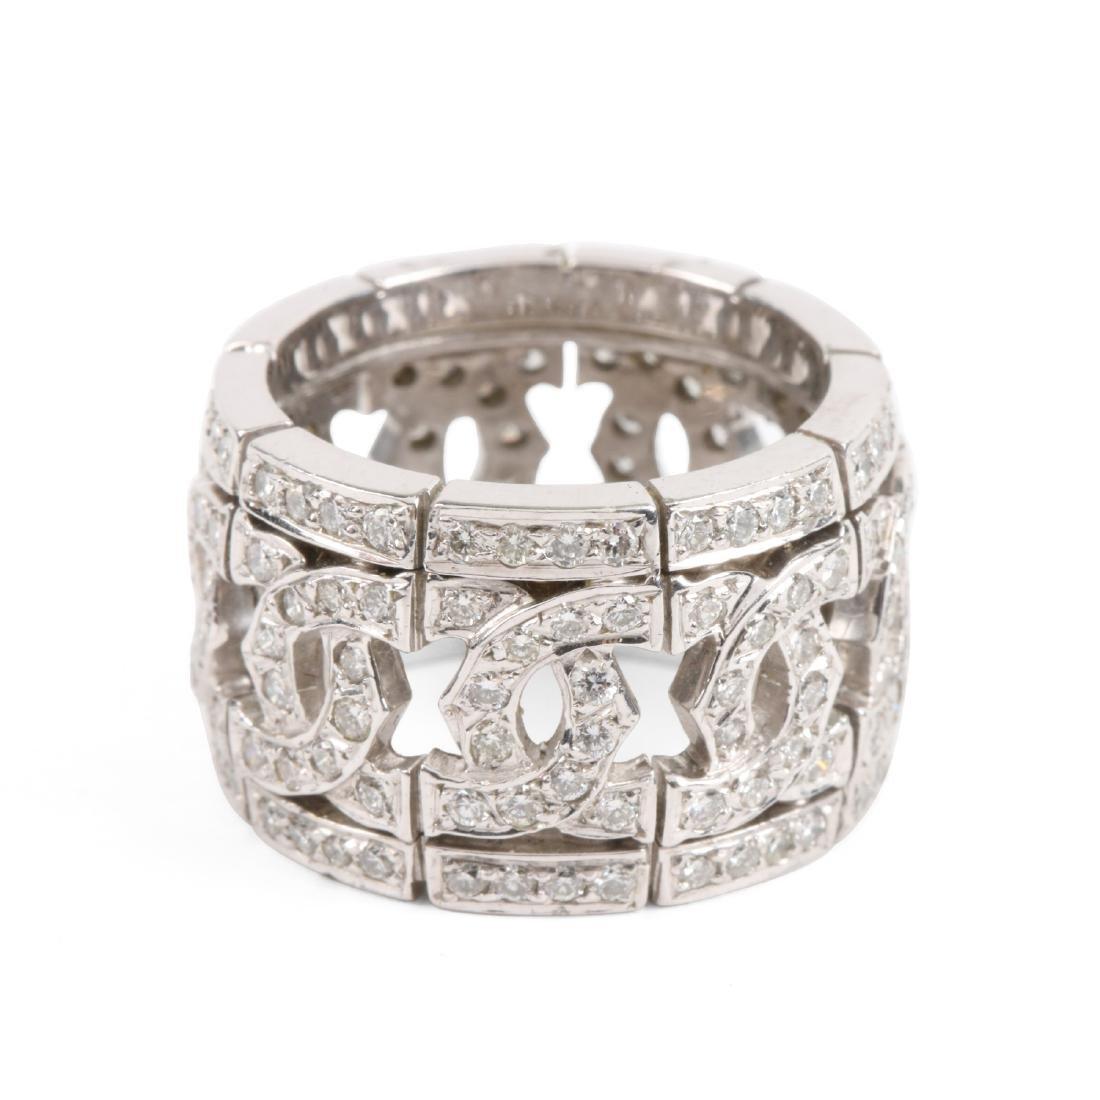 A 14K & Diamond Ring